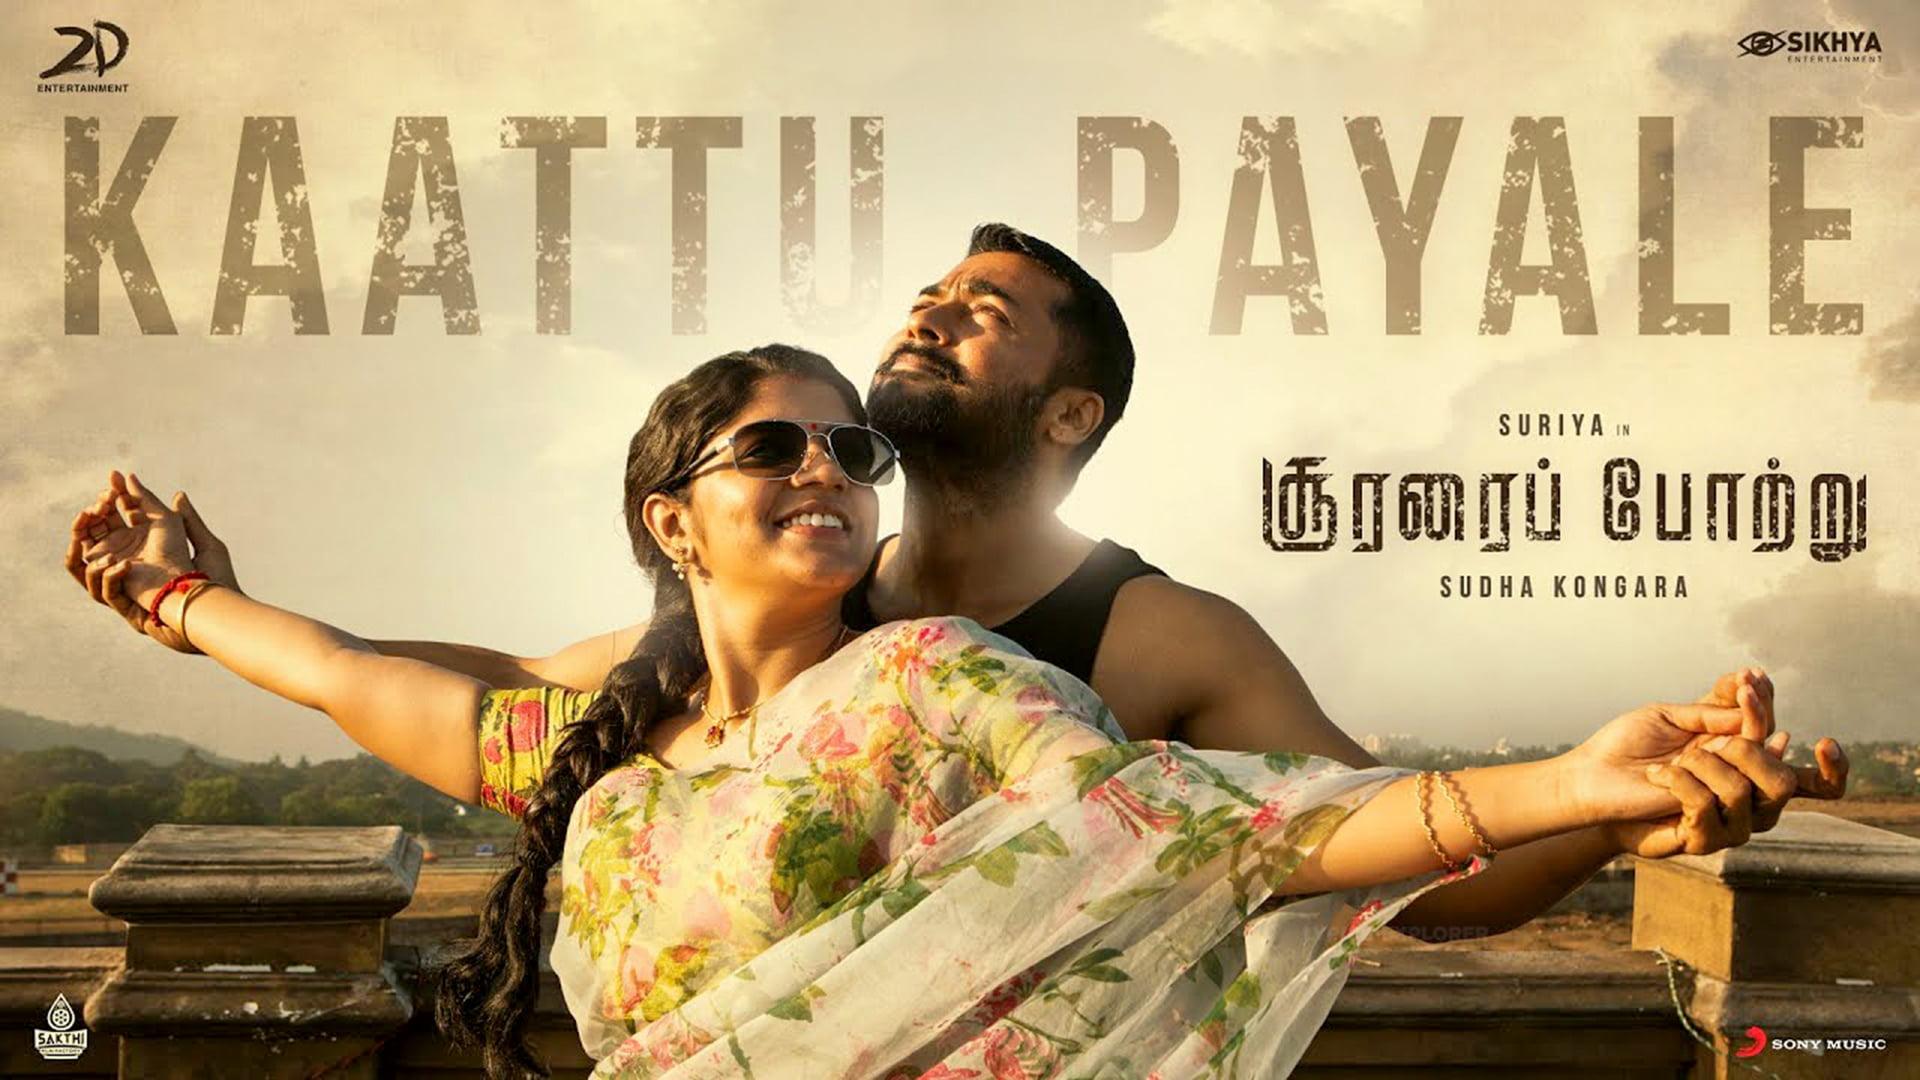 You are currently viewing Kaattu Payale Song Lyrics in English Soorarai Pottru Tamil lyrics free downlaod